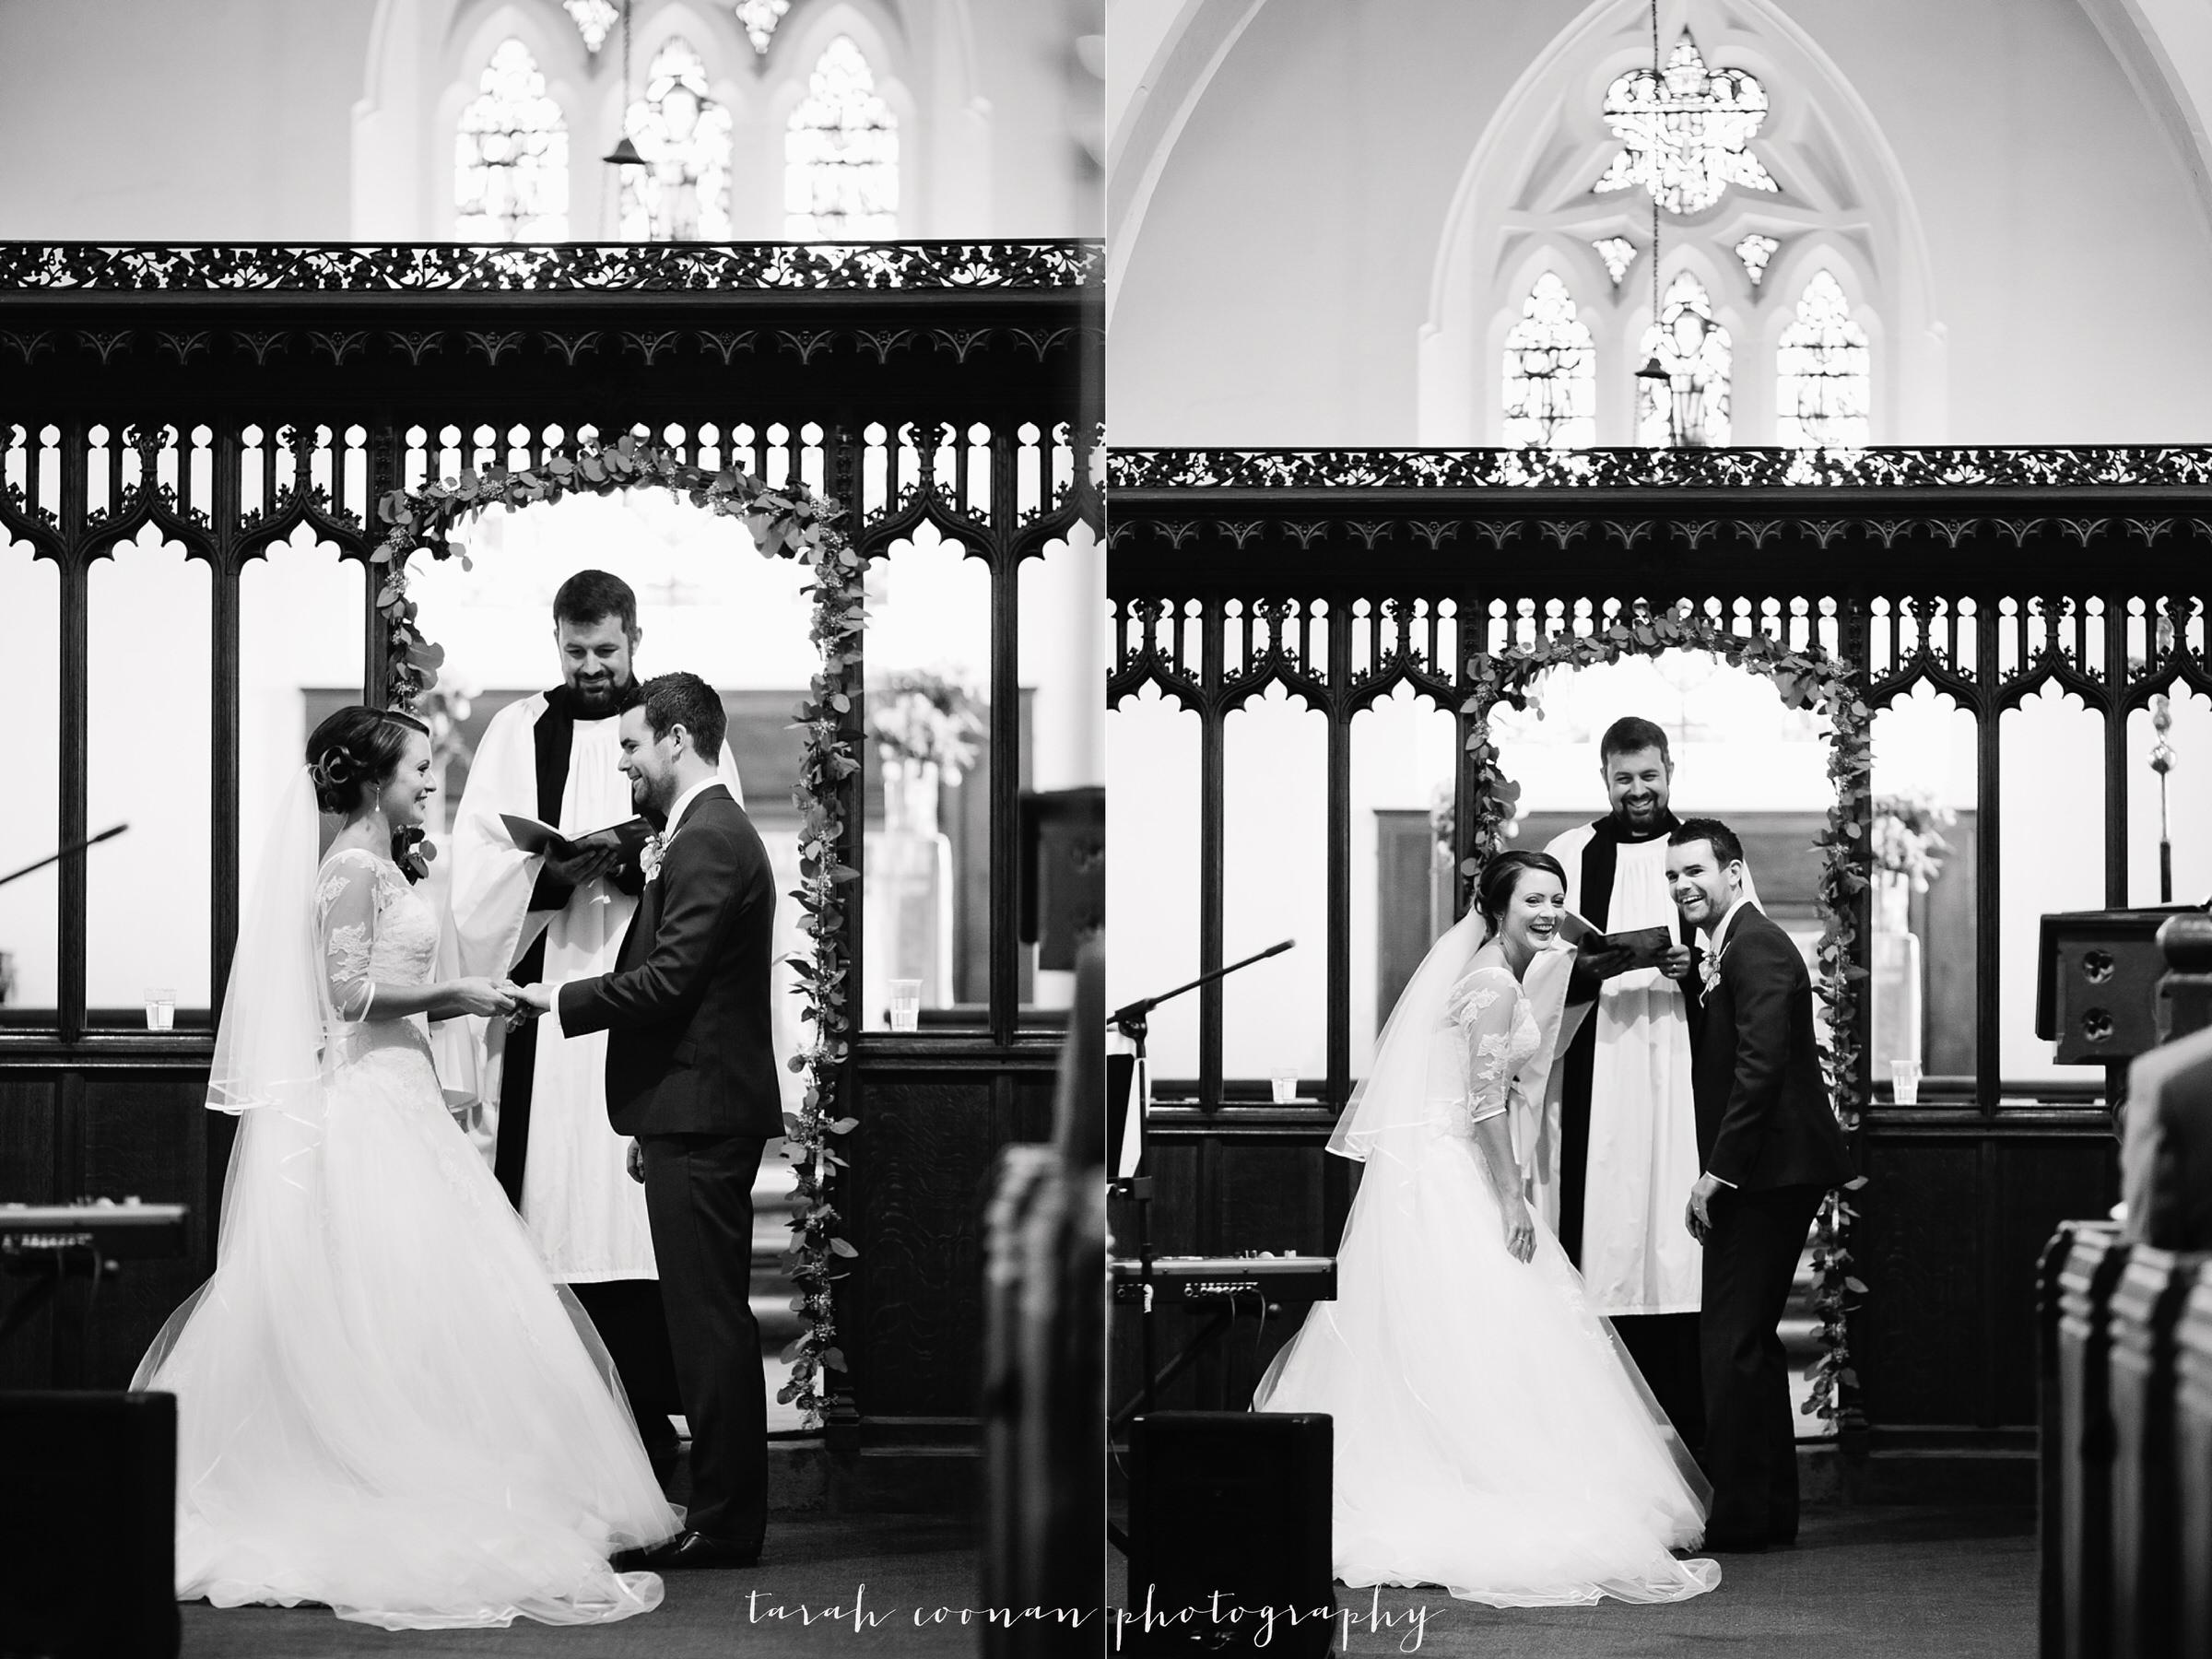 northbrook-park-wedding-photographer_026